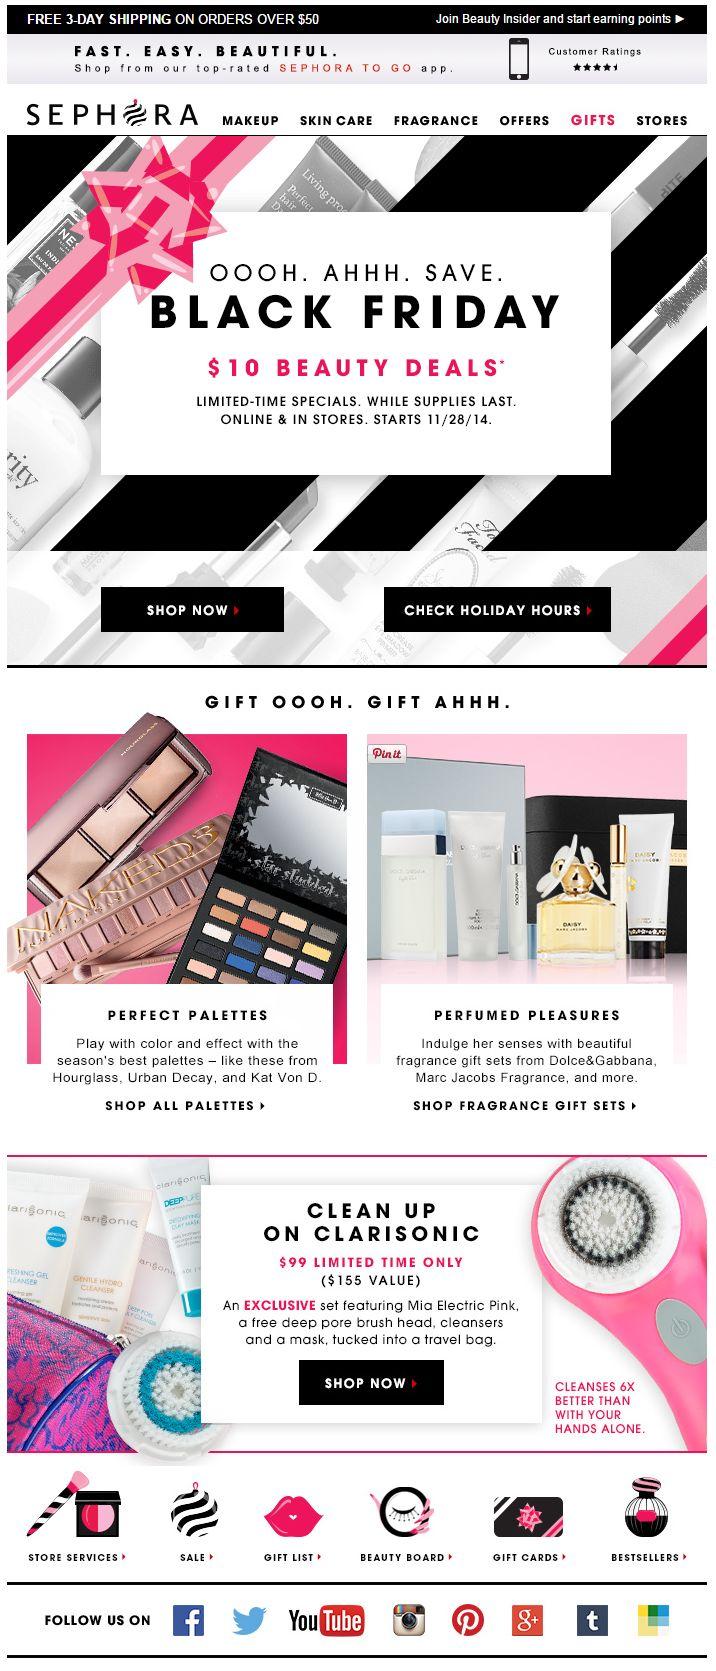 Black Friday Email Marketing Inspiration 2014 / Sephora